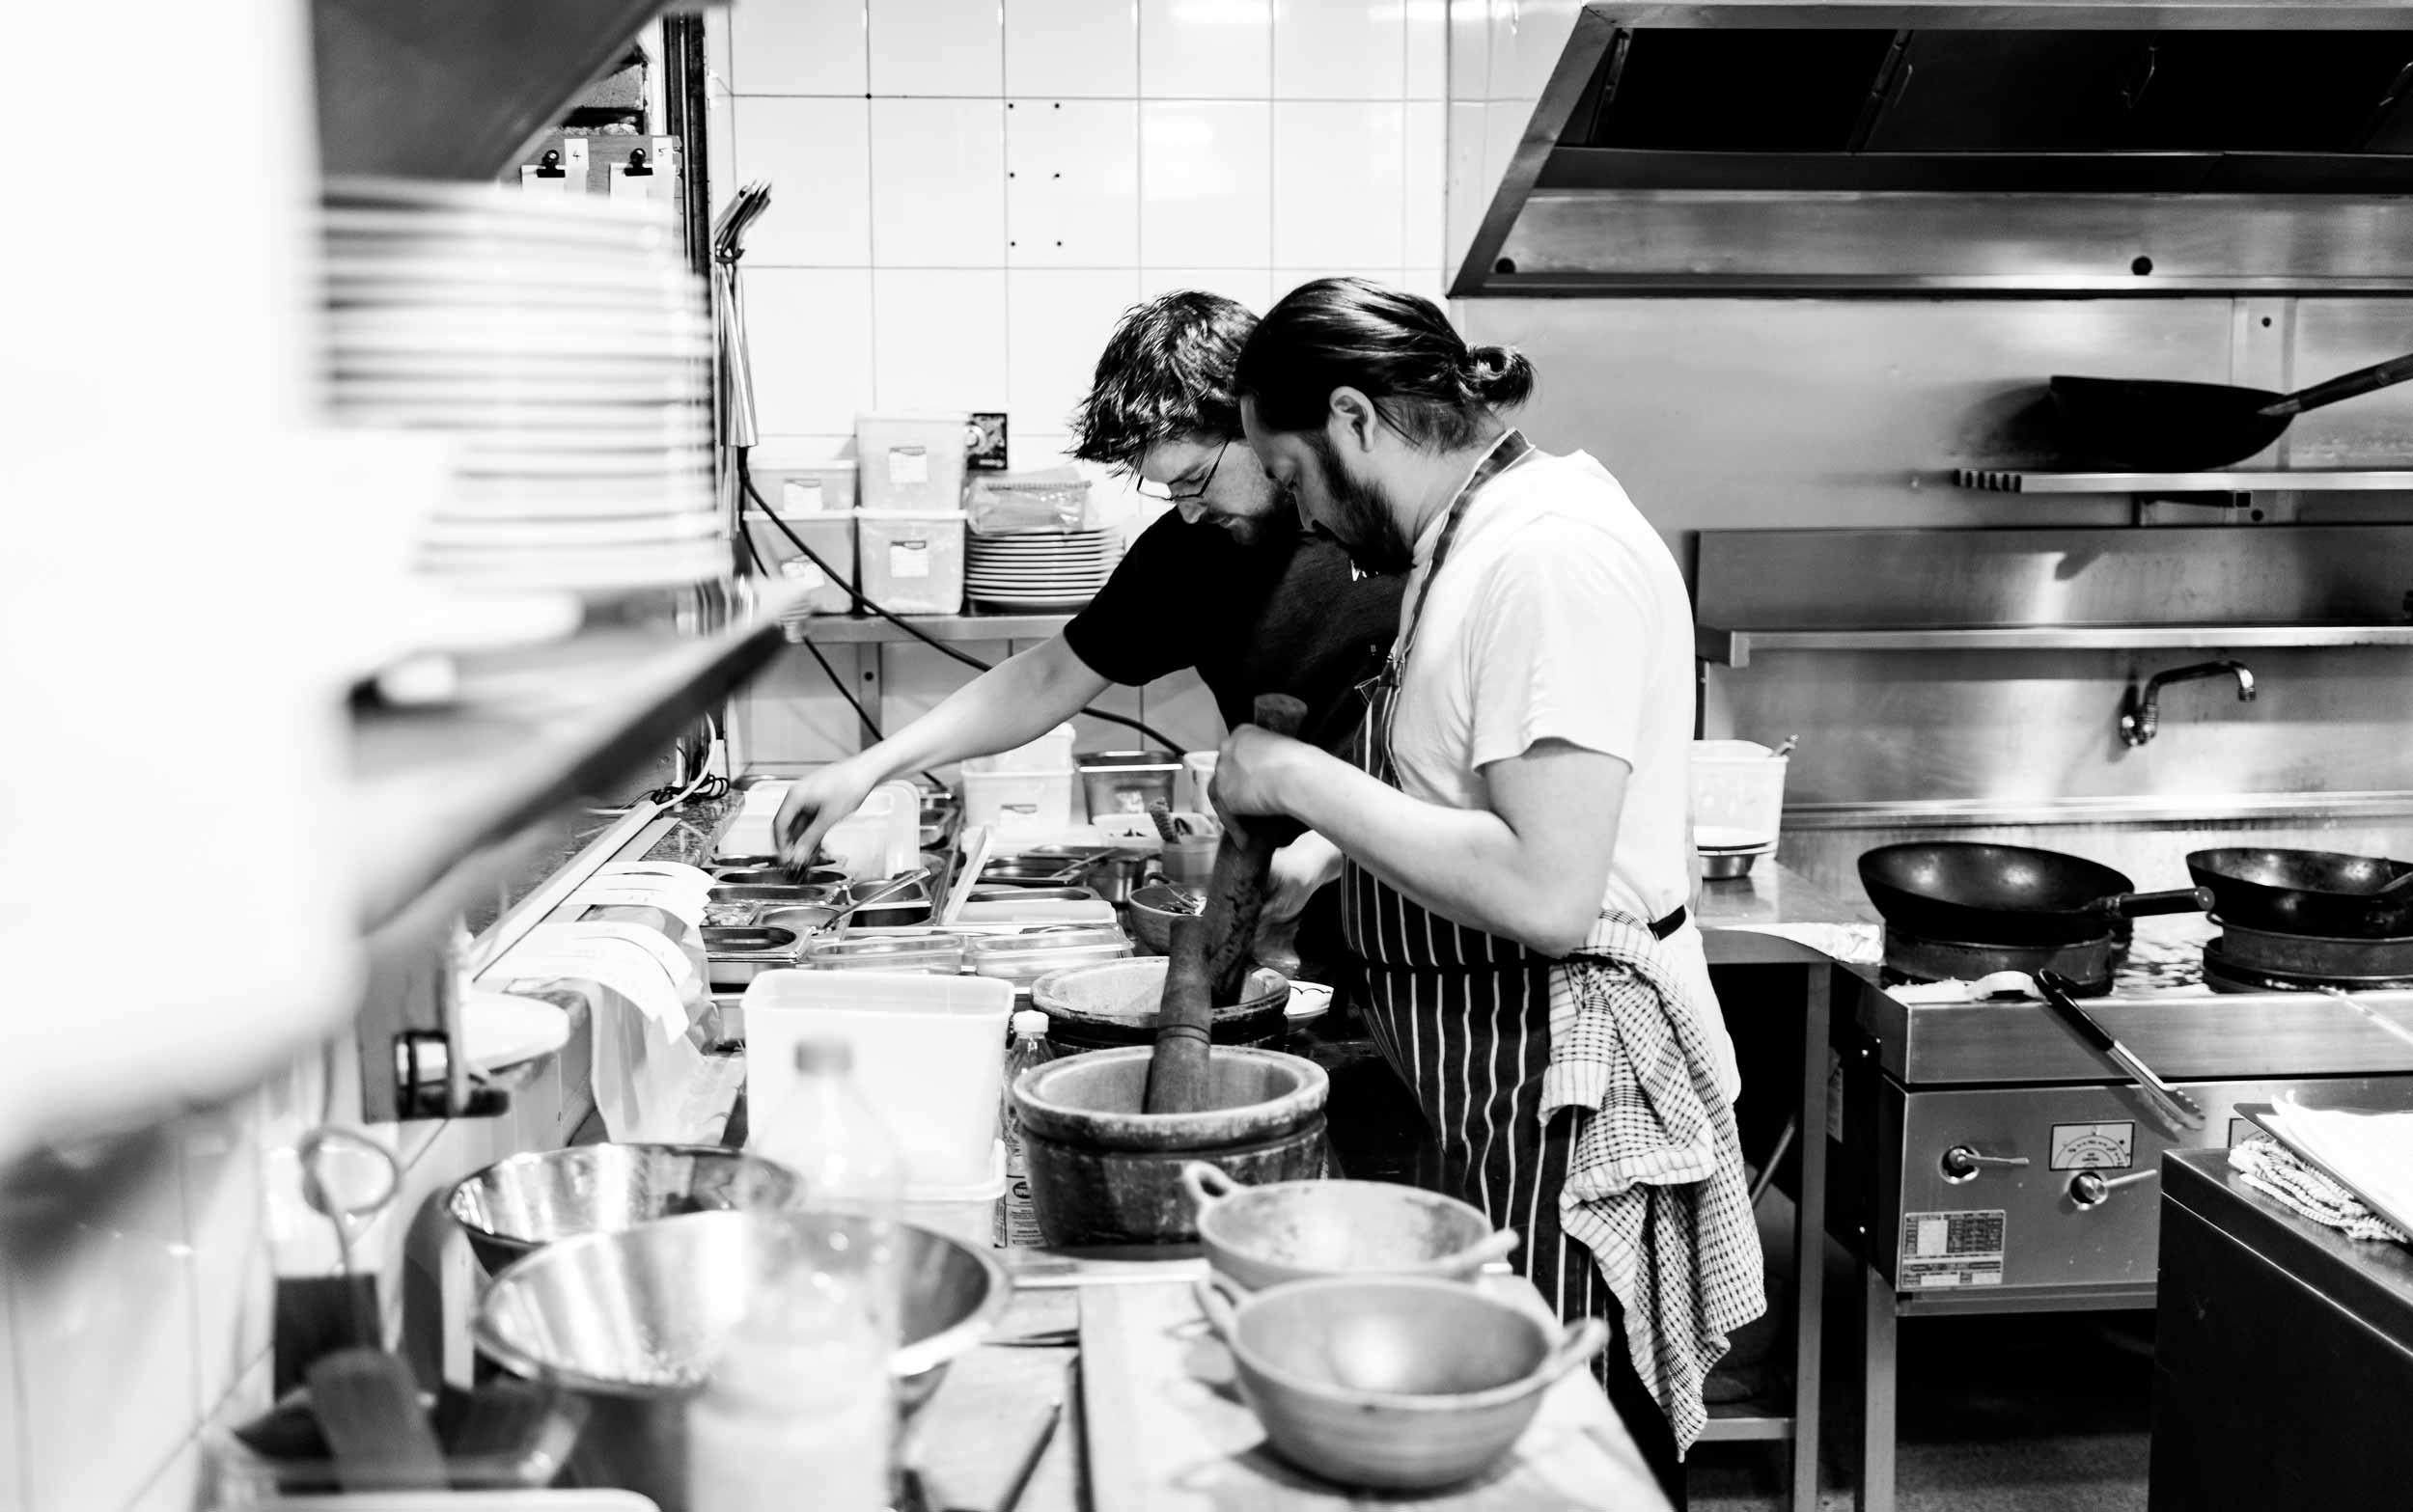 Farang-Thai-Food-Chefs-at-Work.jpg